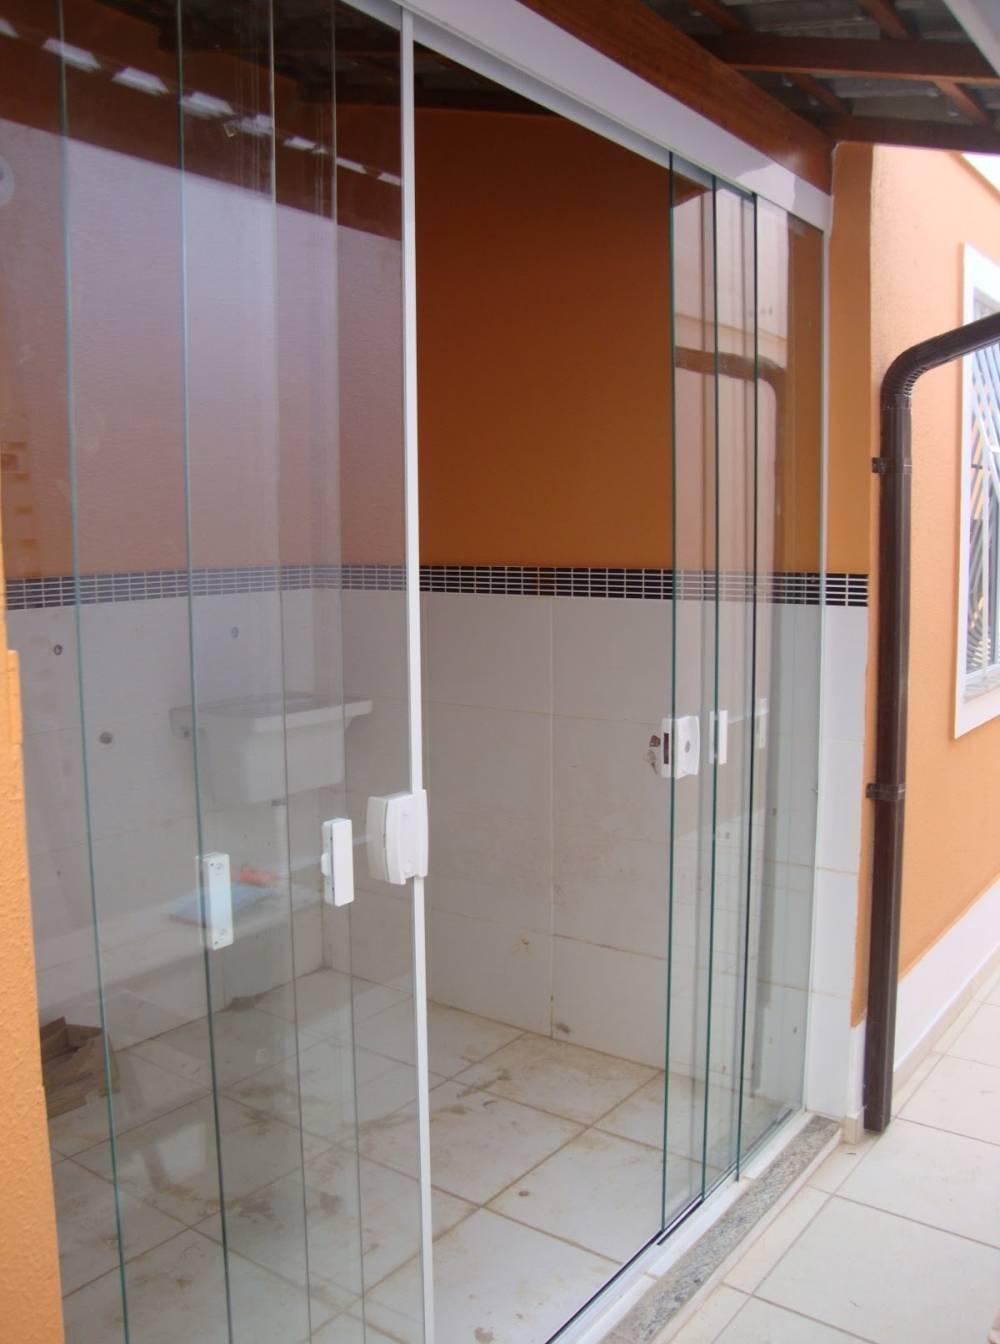 Porta de Vidro com Fechadura Preço na Vila Curuçá - Porta de Vidro Eletrônica